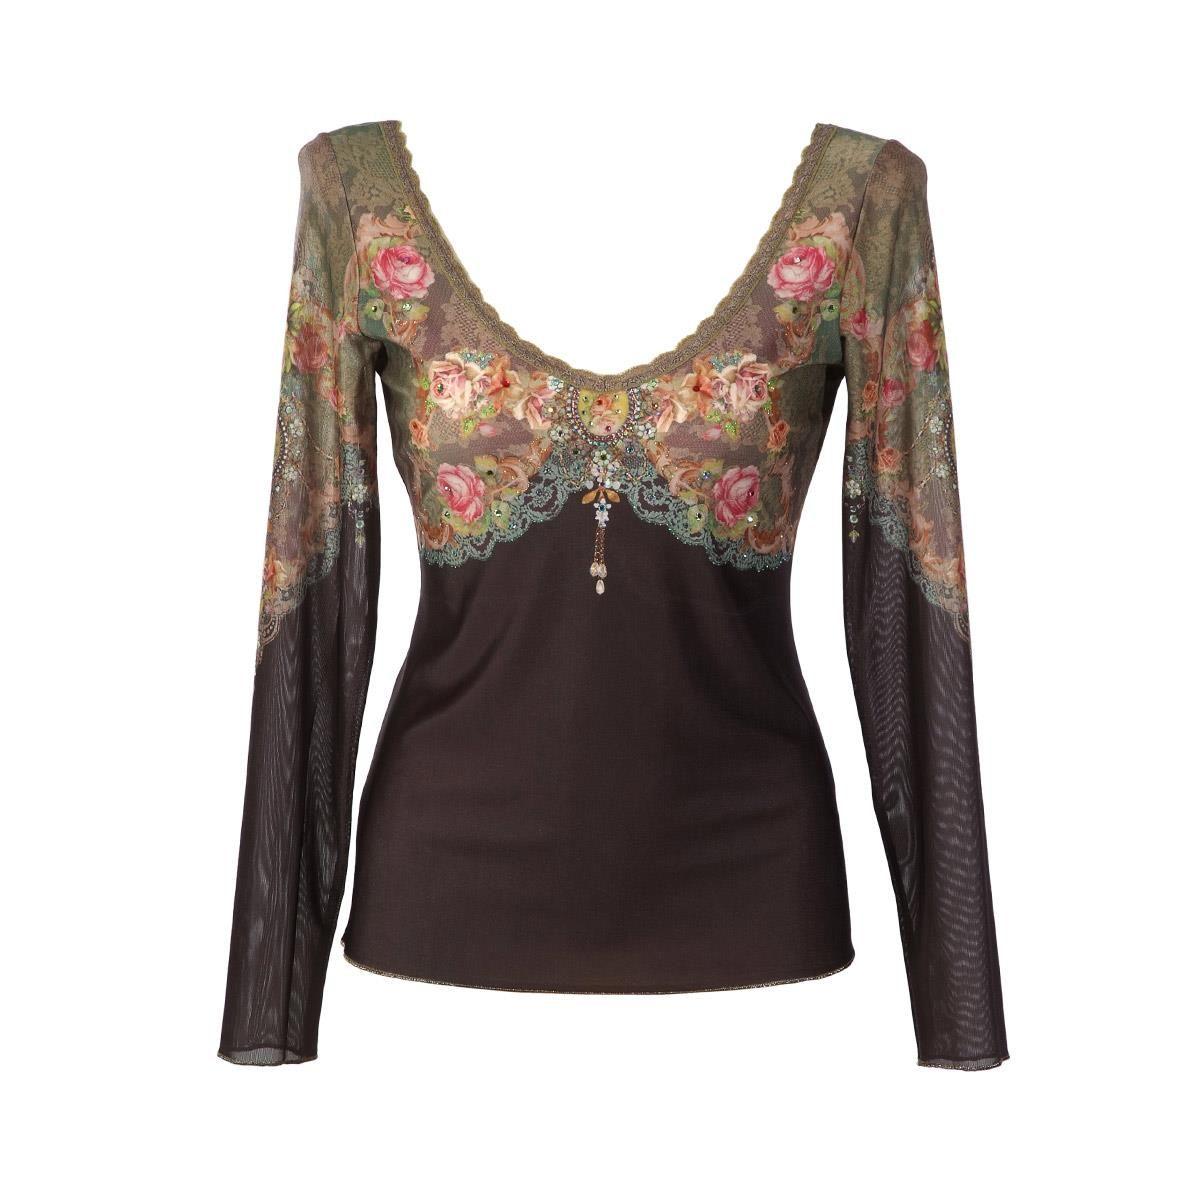 michael degrin top   Fashion. Boho chic fashion. Clothes